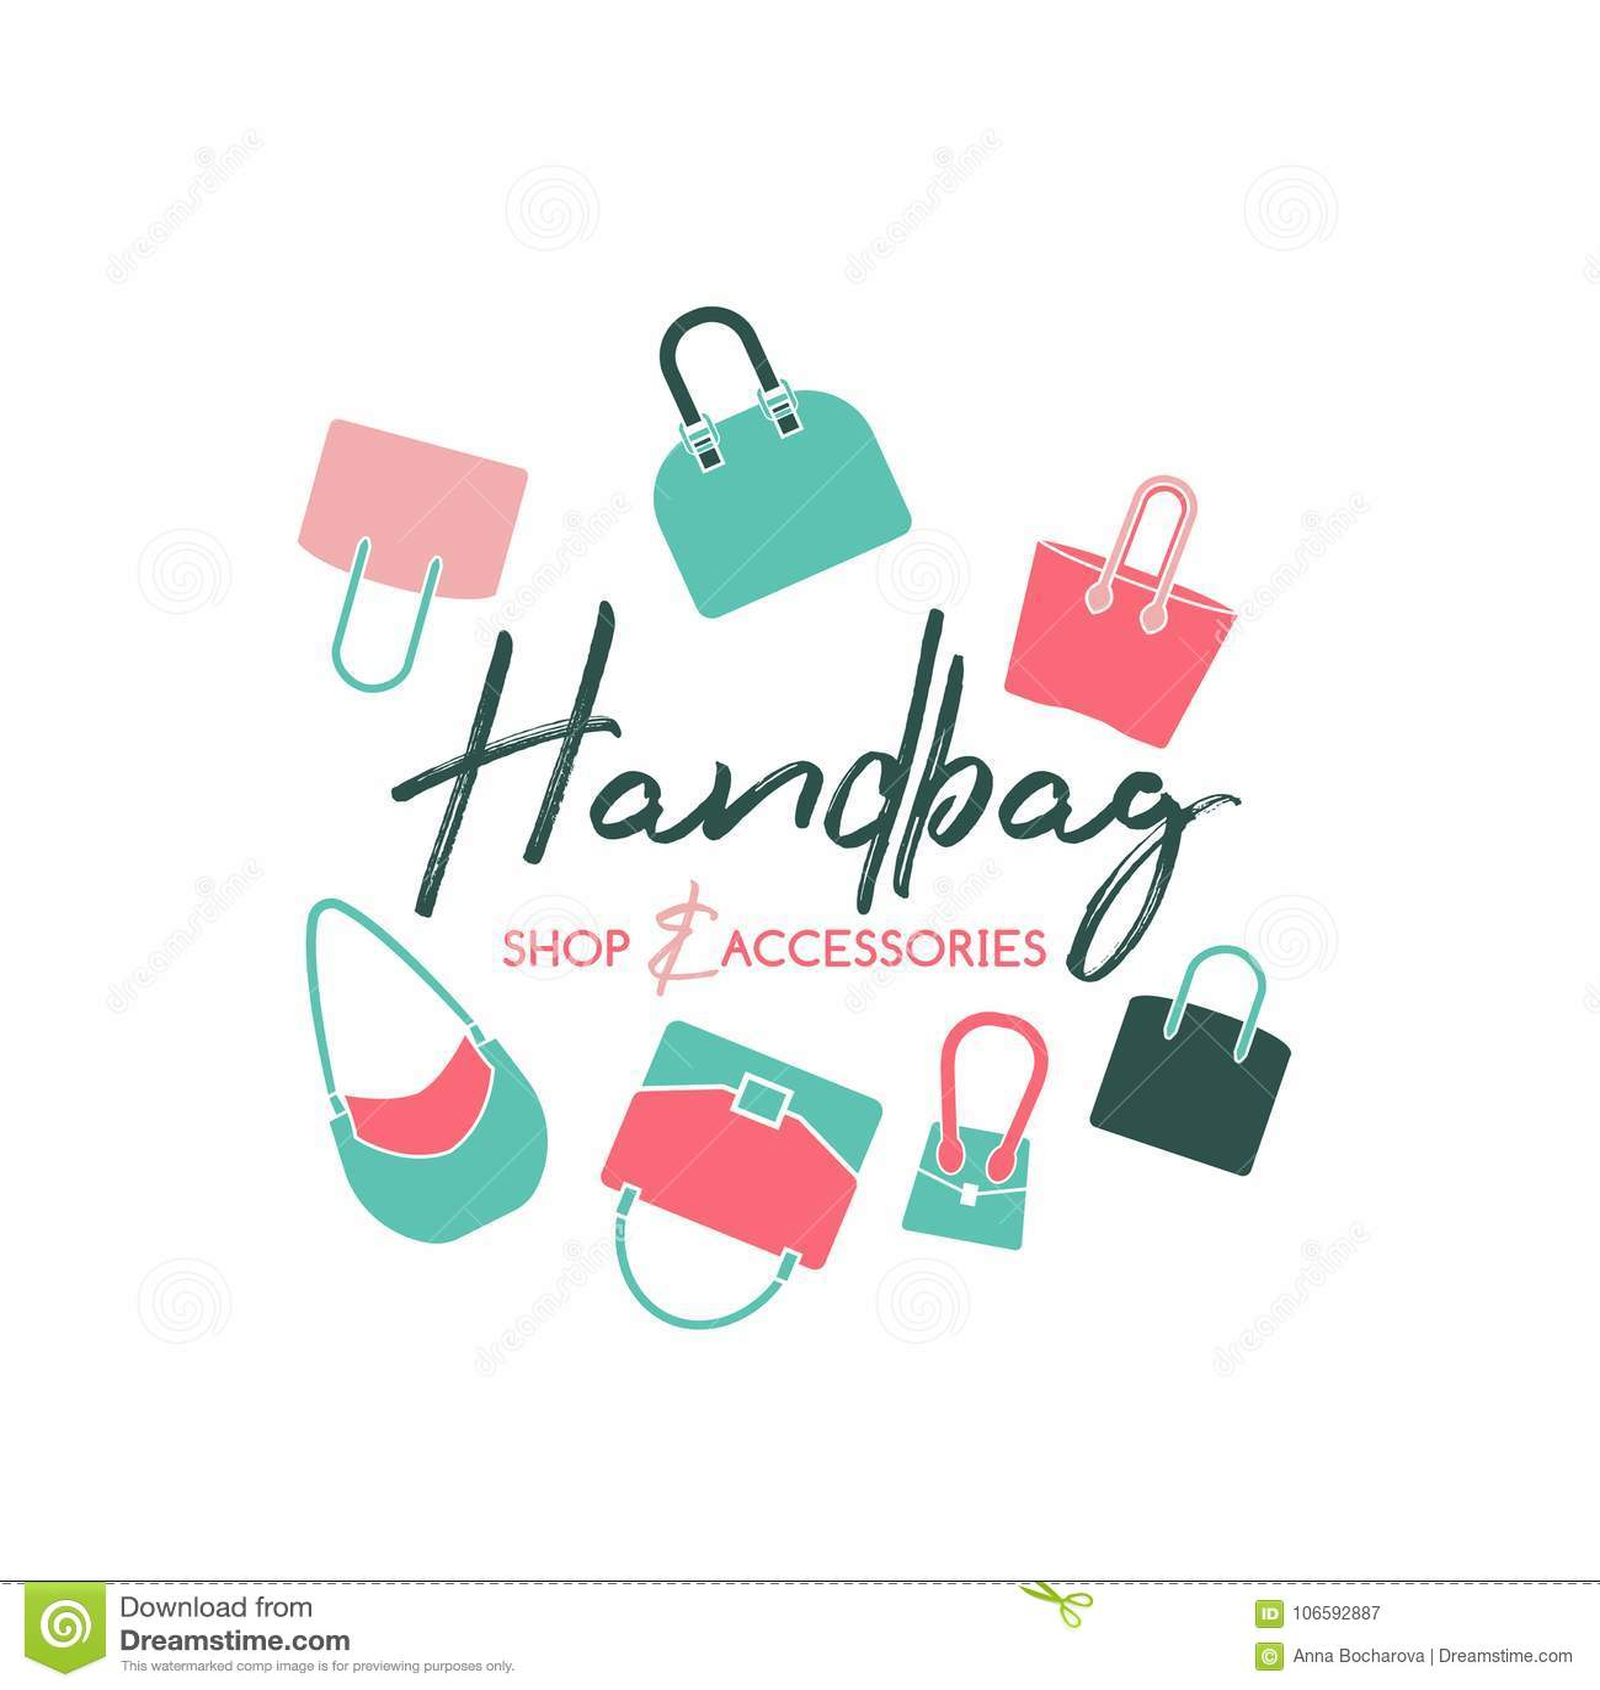 4021de5027 Handbag shop logo in a modern flat style. Vector illustration in pink